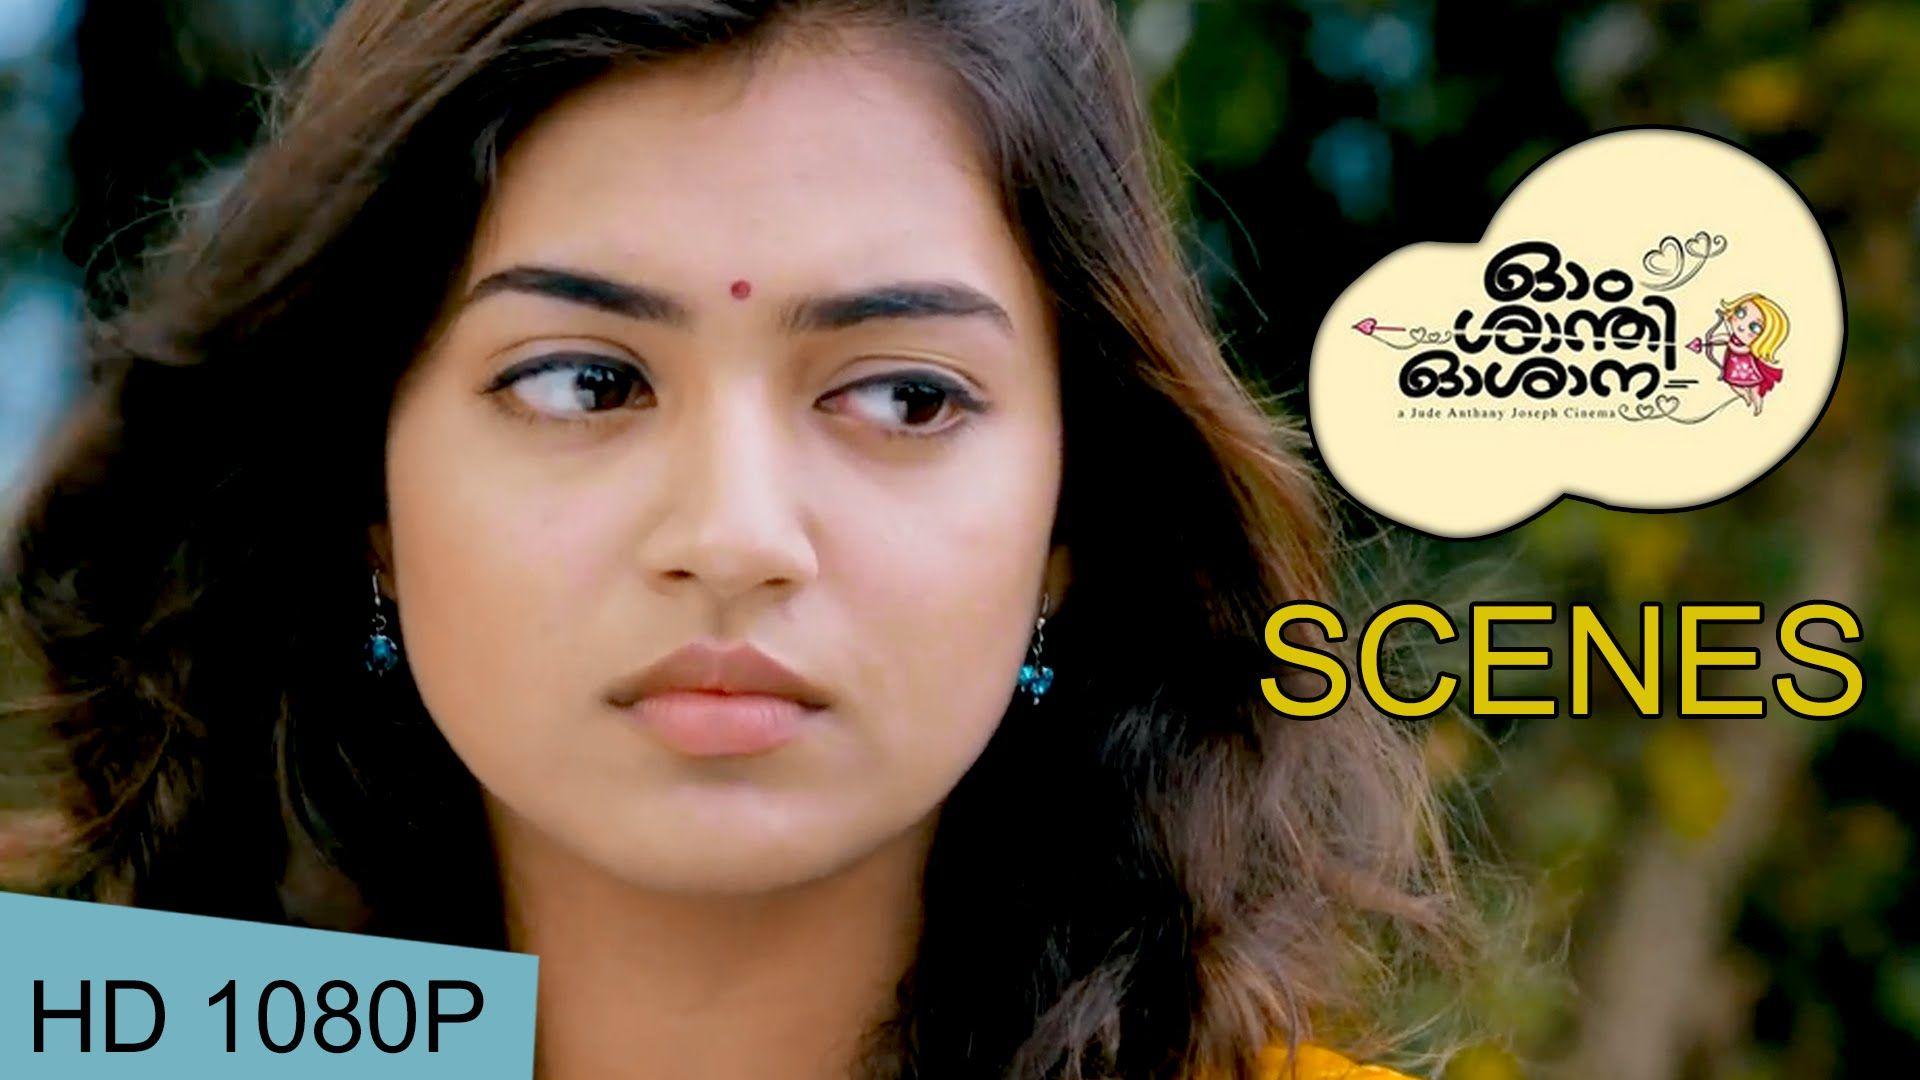 Remarkable Om Shanti Oshana Movie Scenes Hd Nivin Pauly Proposes Nazriya Hairstyles For Women Draintrainus